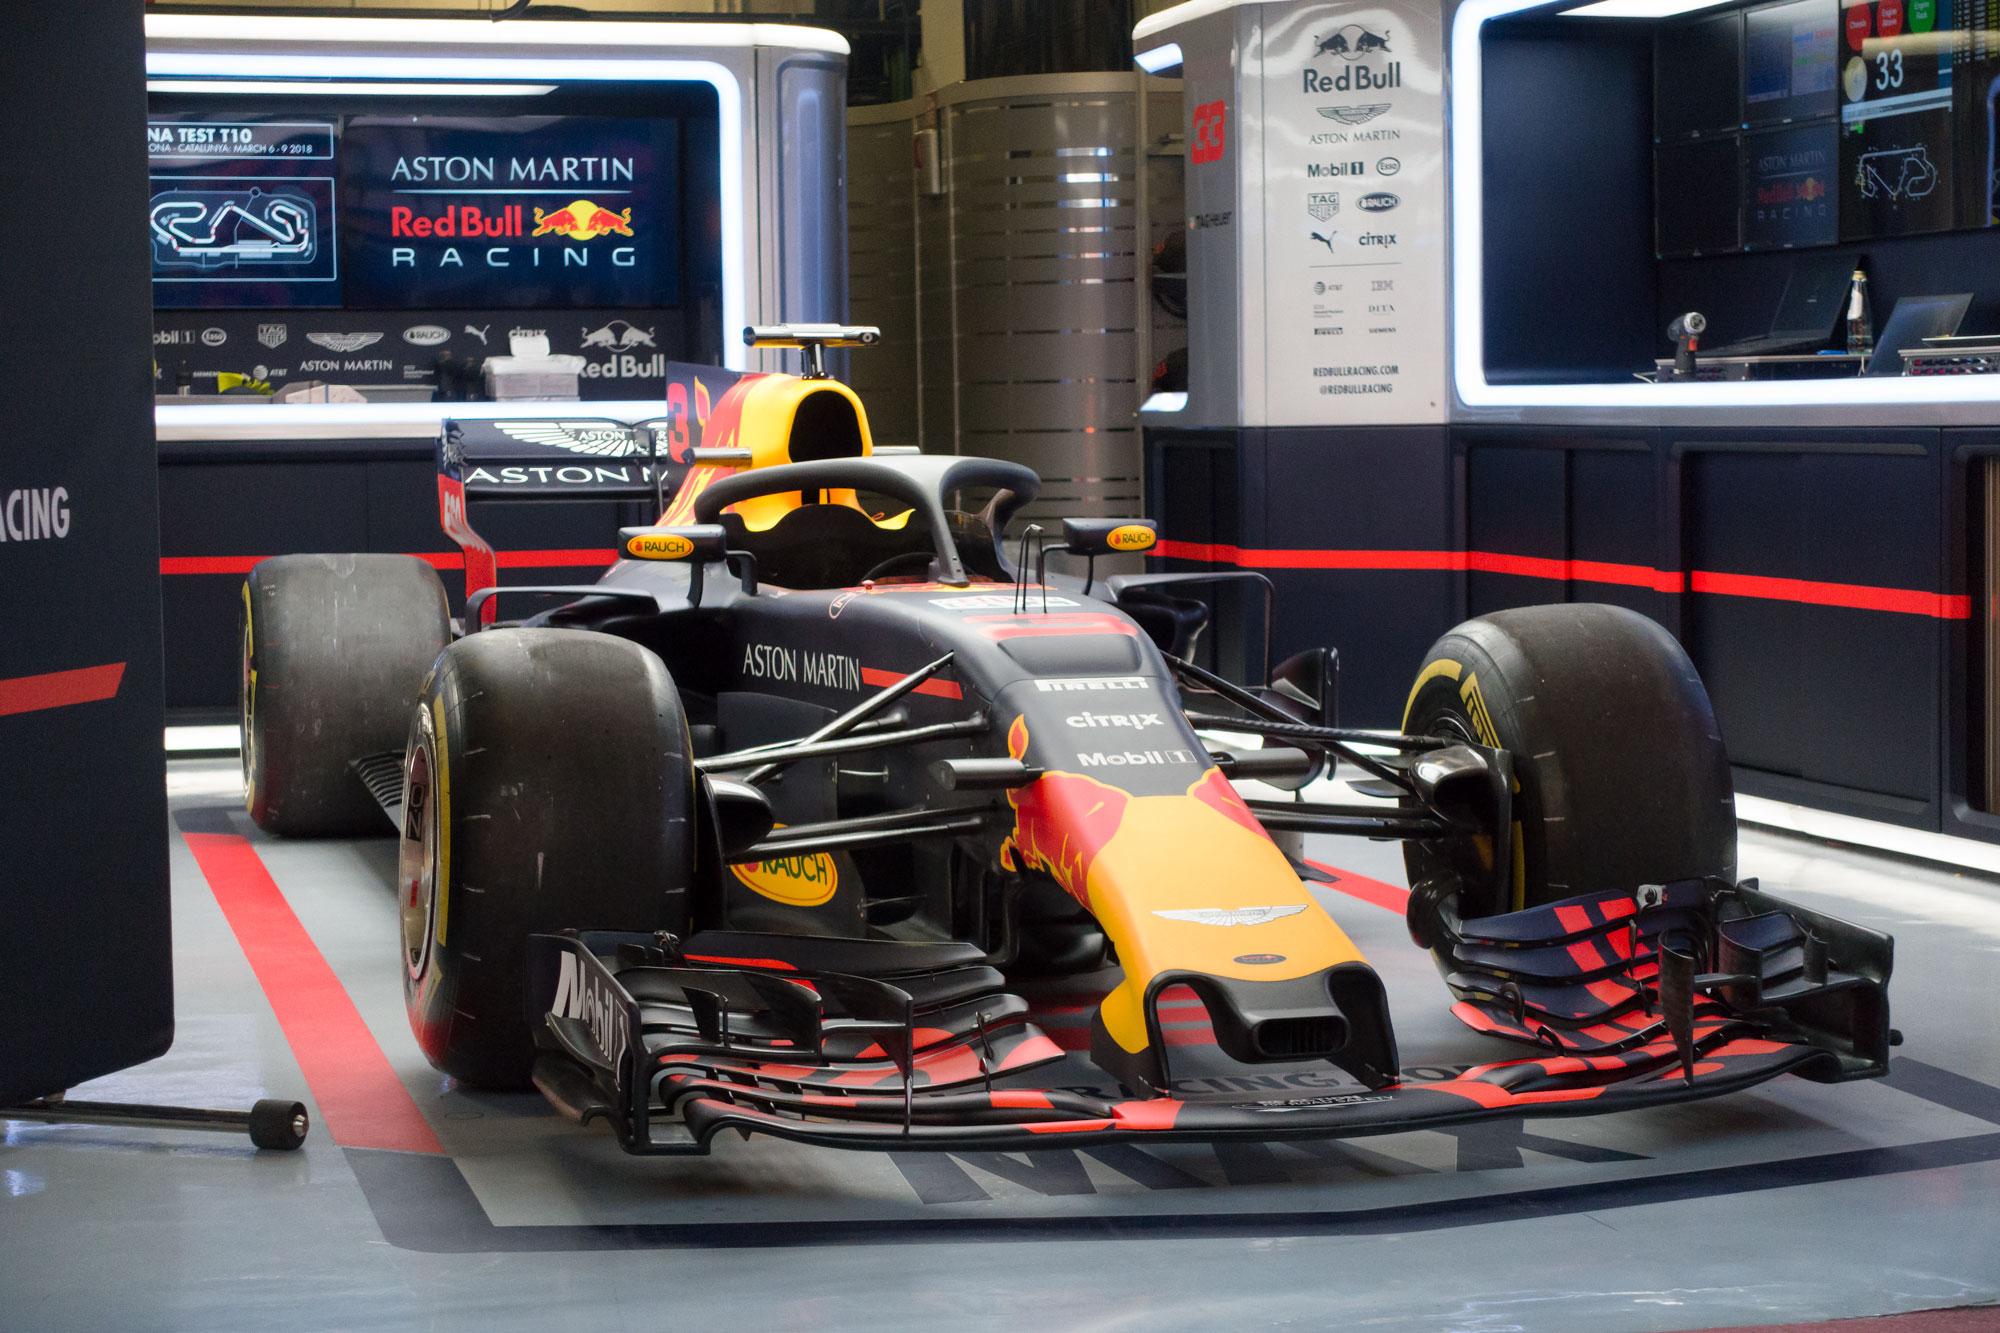 Aston Martin Red Bull Racing, Formula 1 testing, Barcelona 2018